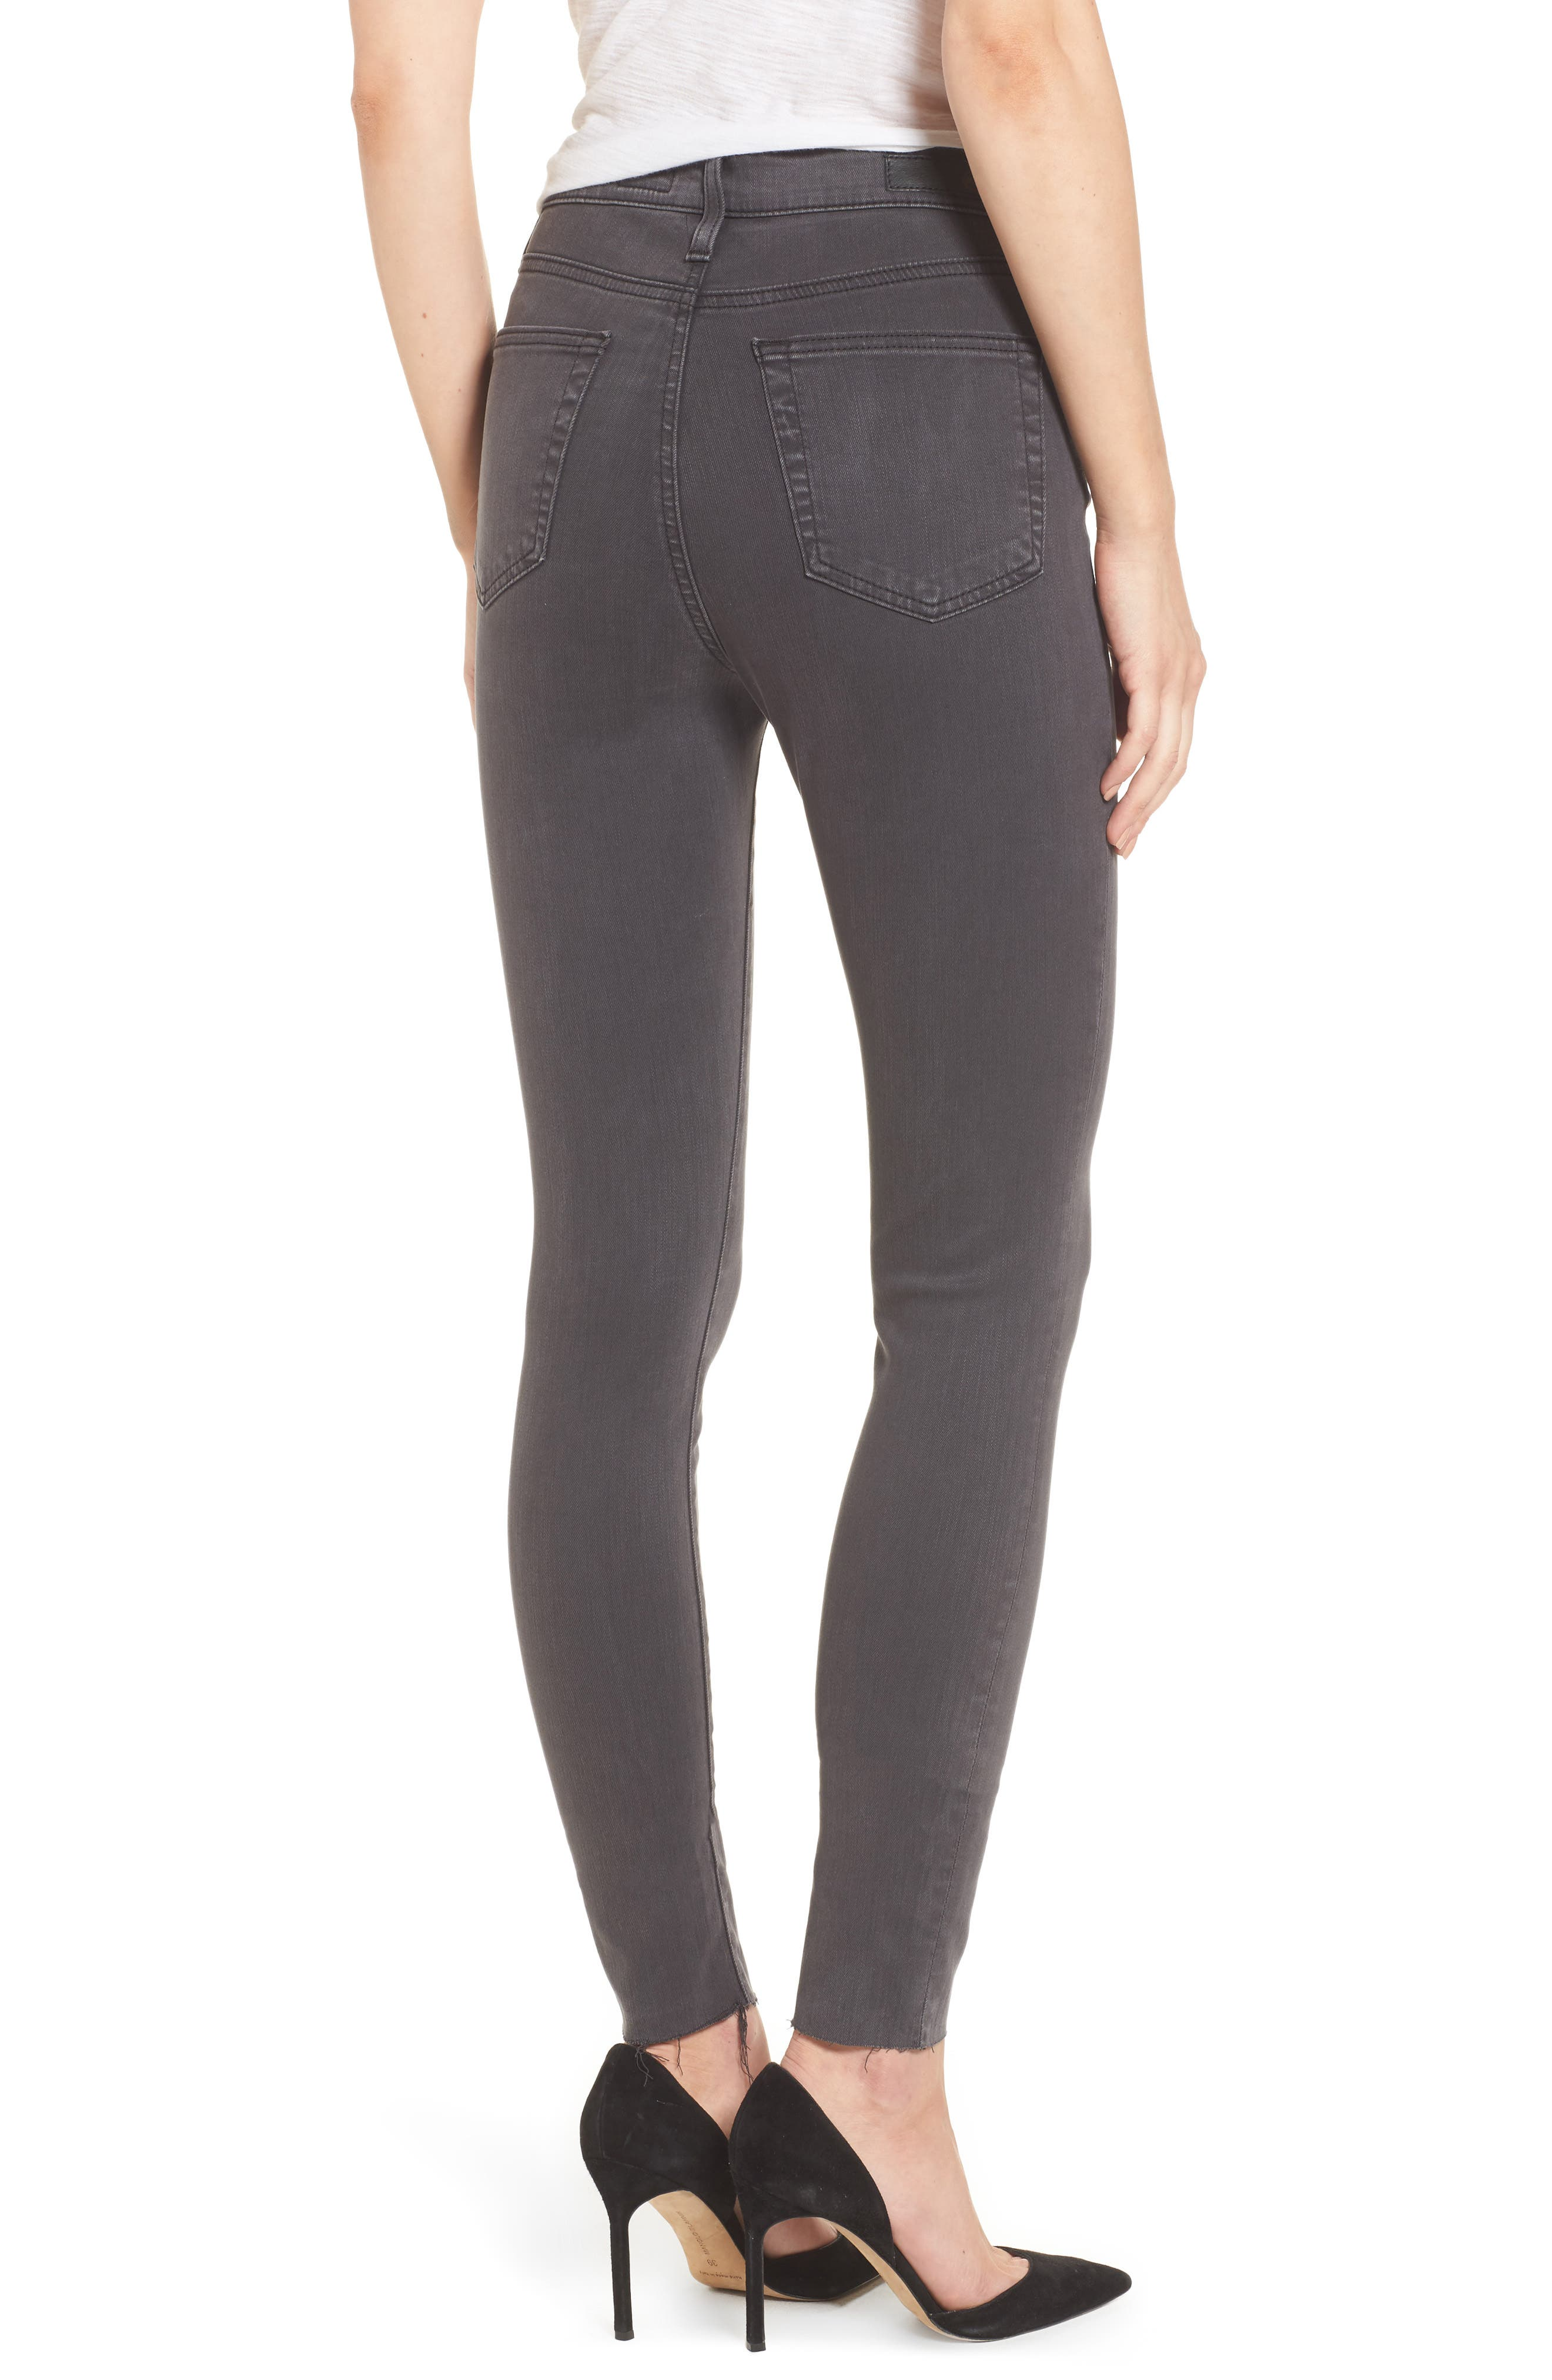 Mila High Rise Skinny Jeans,                             Alternate thumbnail 2, color,                             Interstellar Black